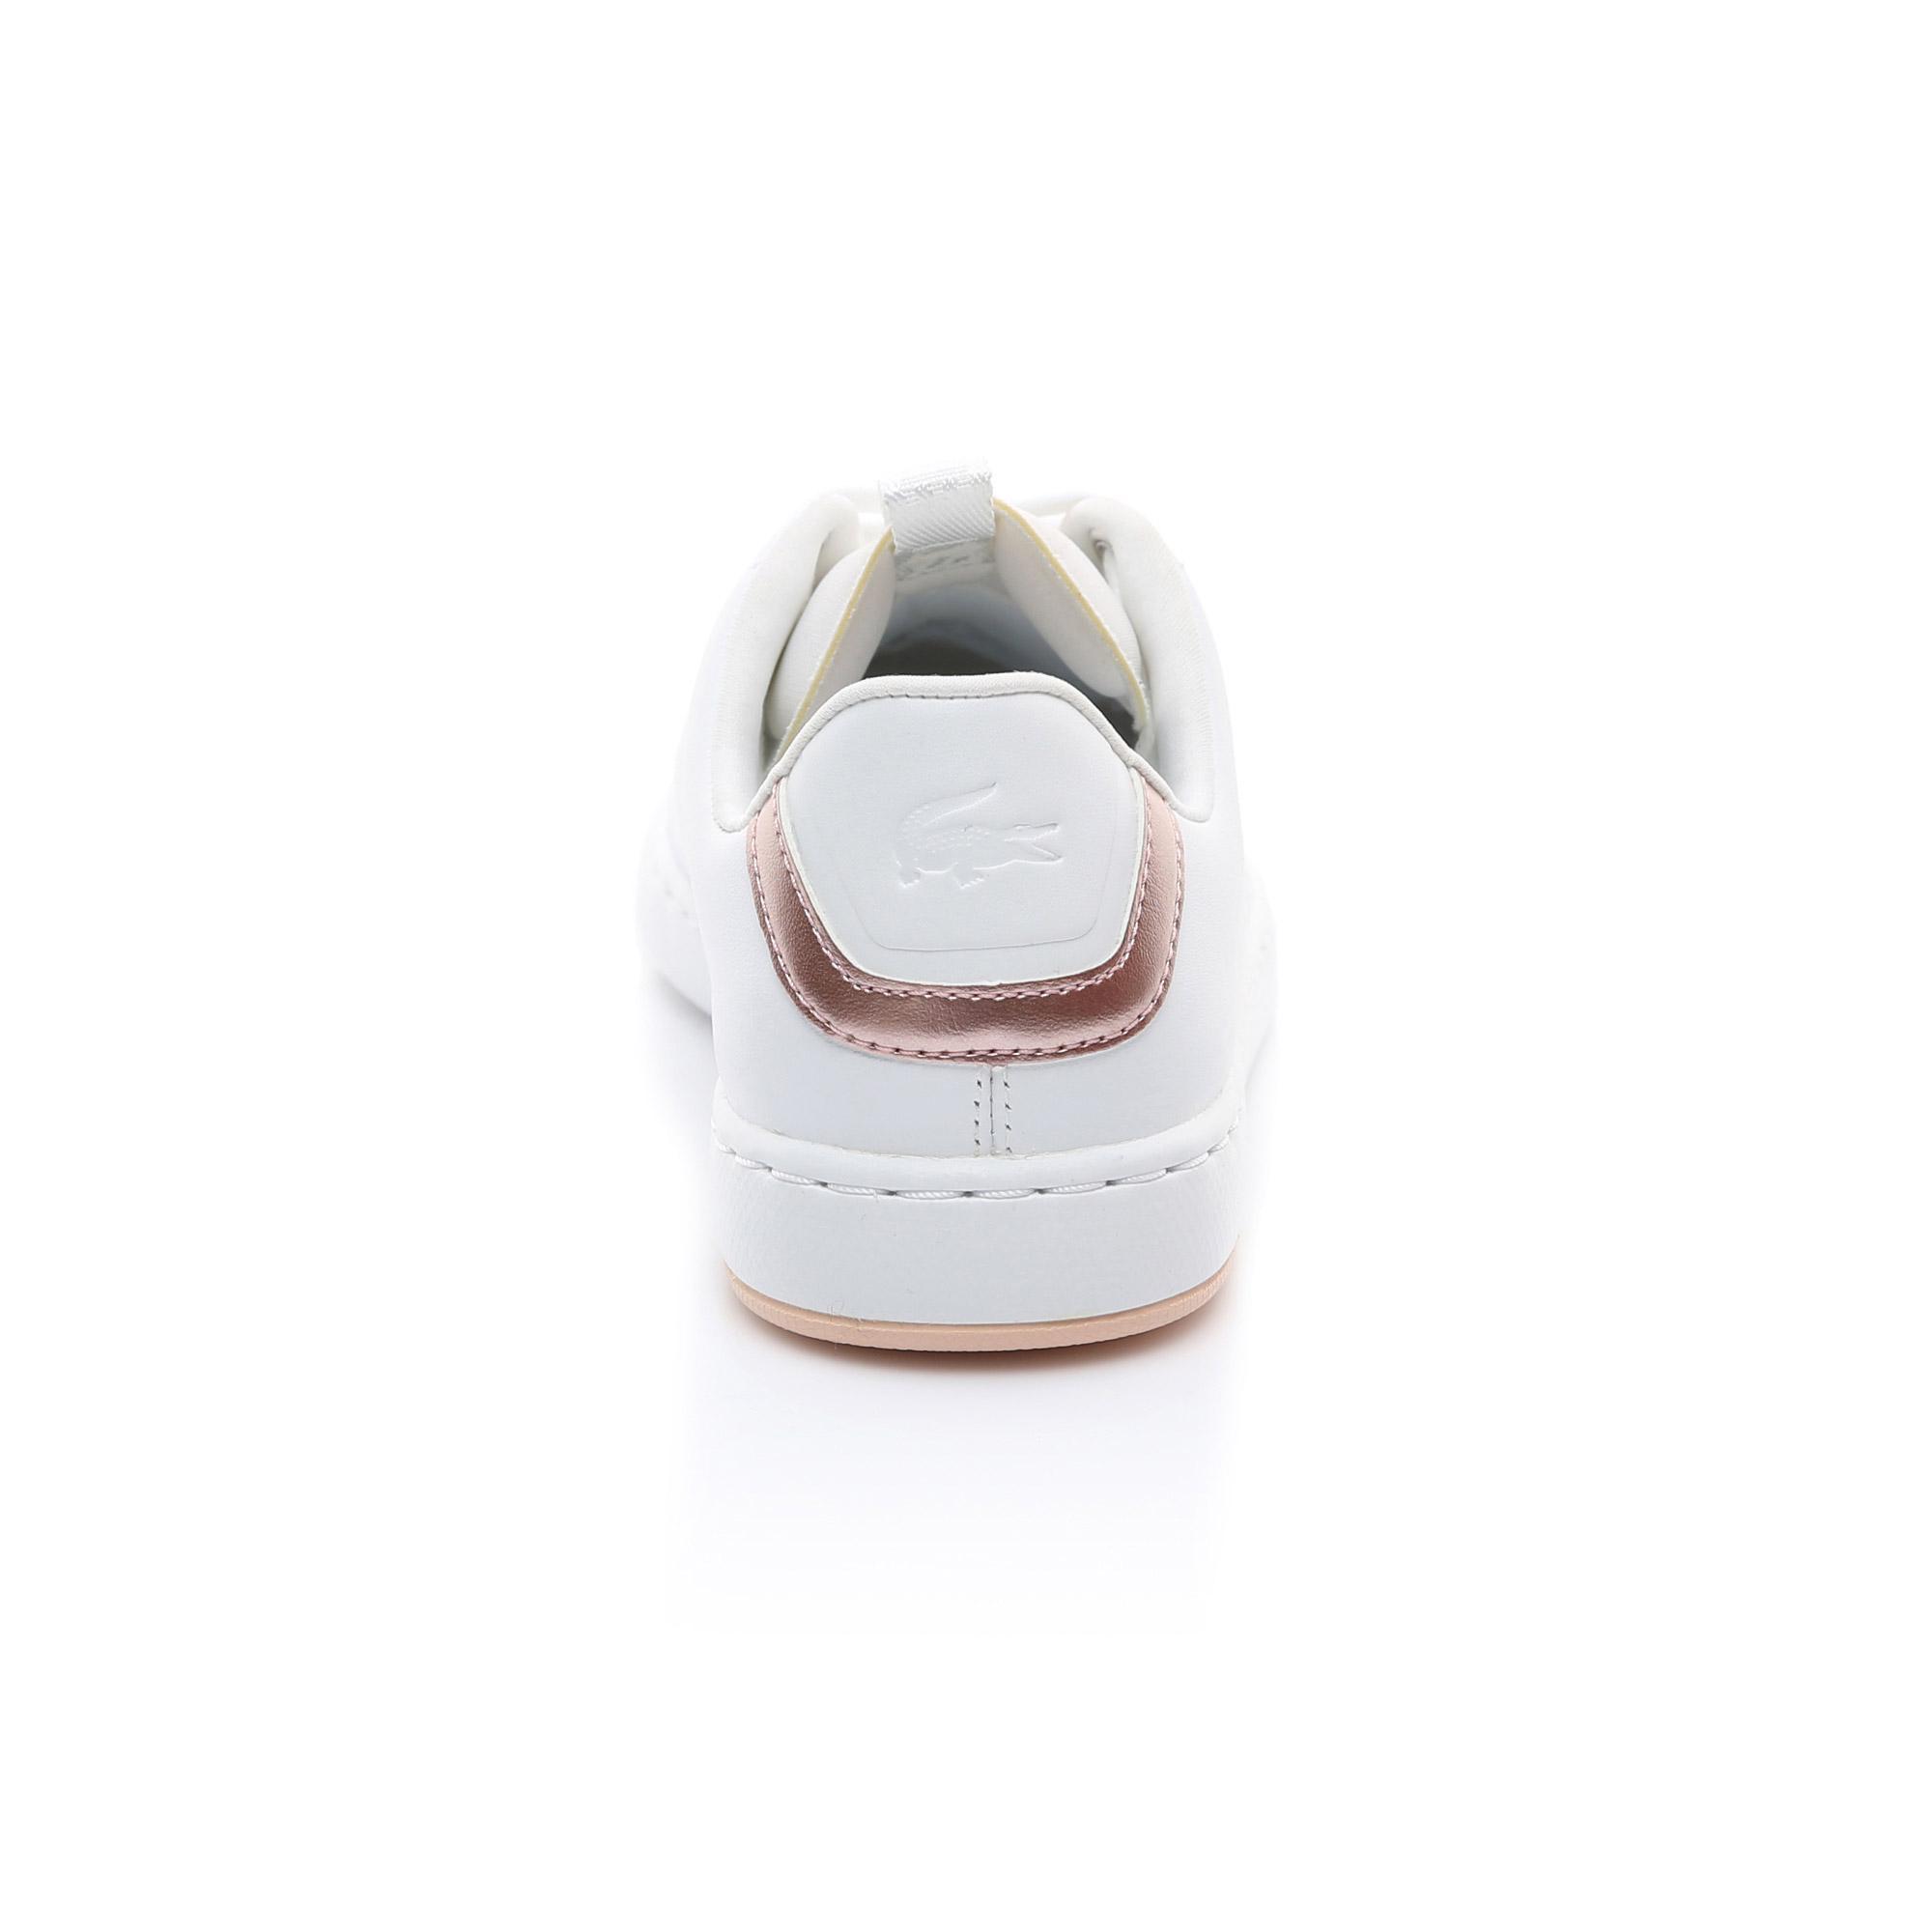 Lacoste Carnaby Evo Light-WT 119 3 Damskie Sneakersy